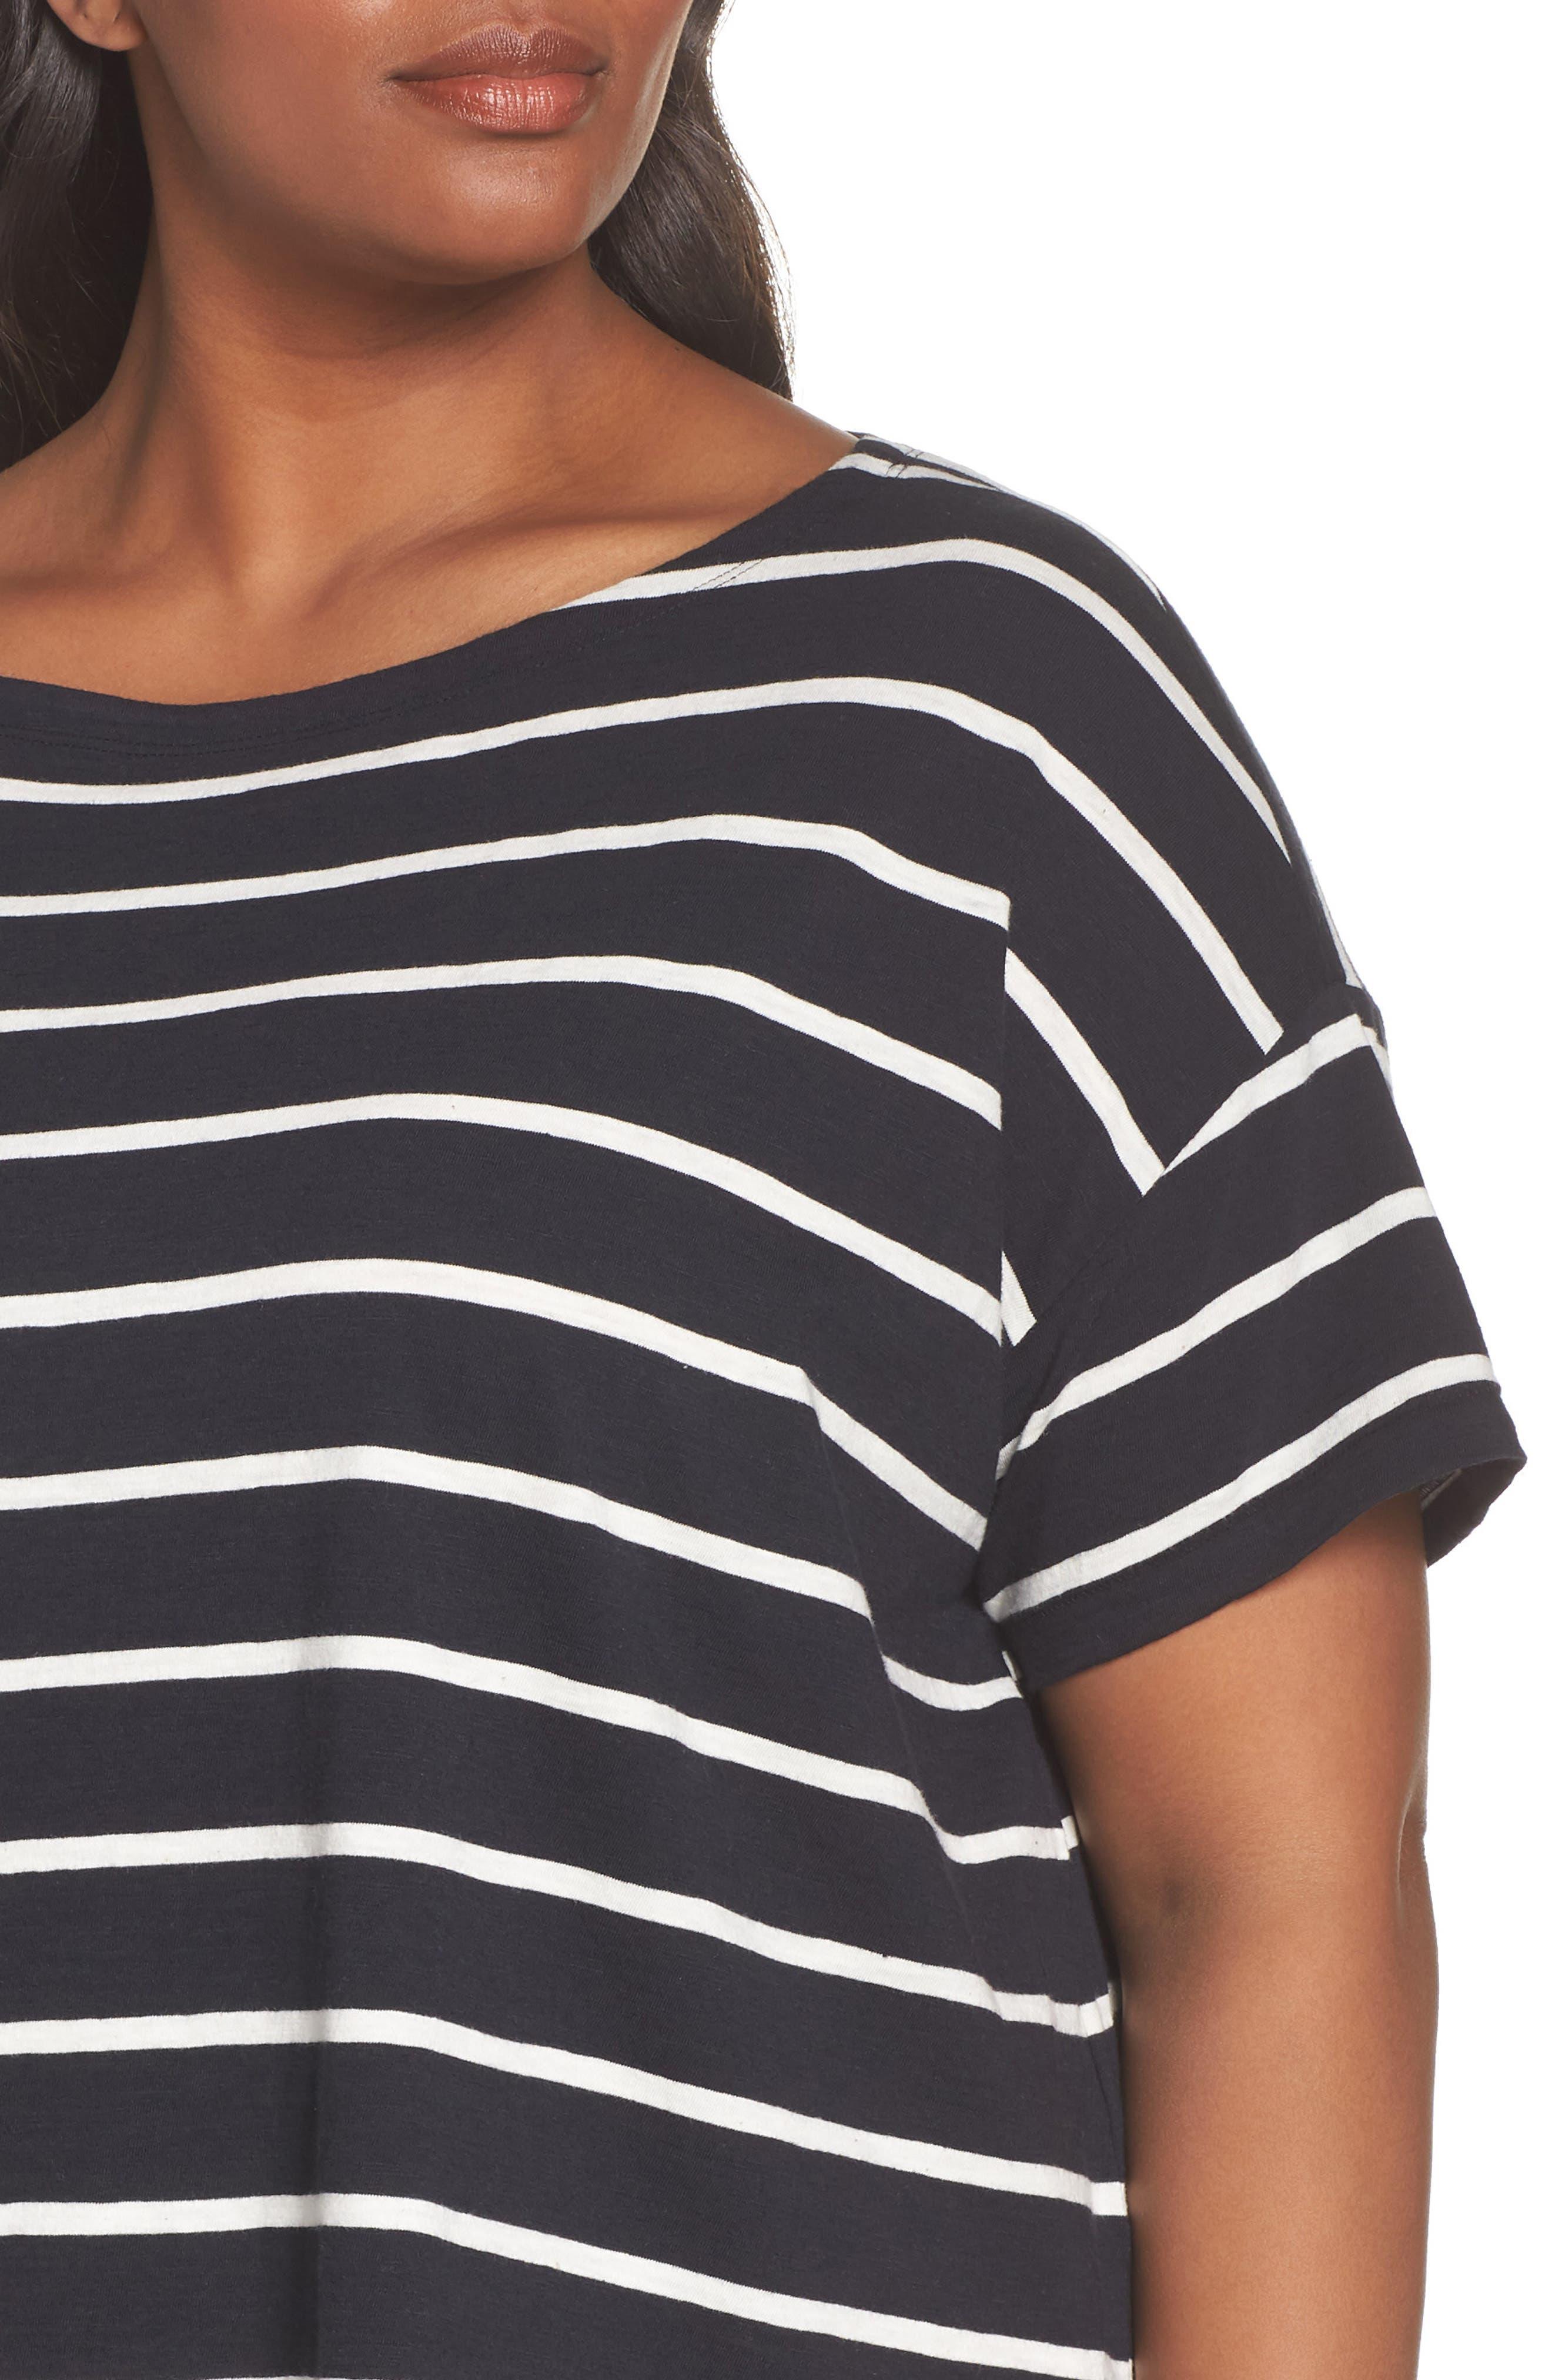 Stripe Organic Cotton Top,                             Alternate thumbnail 4, color,                             Black/ White